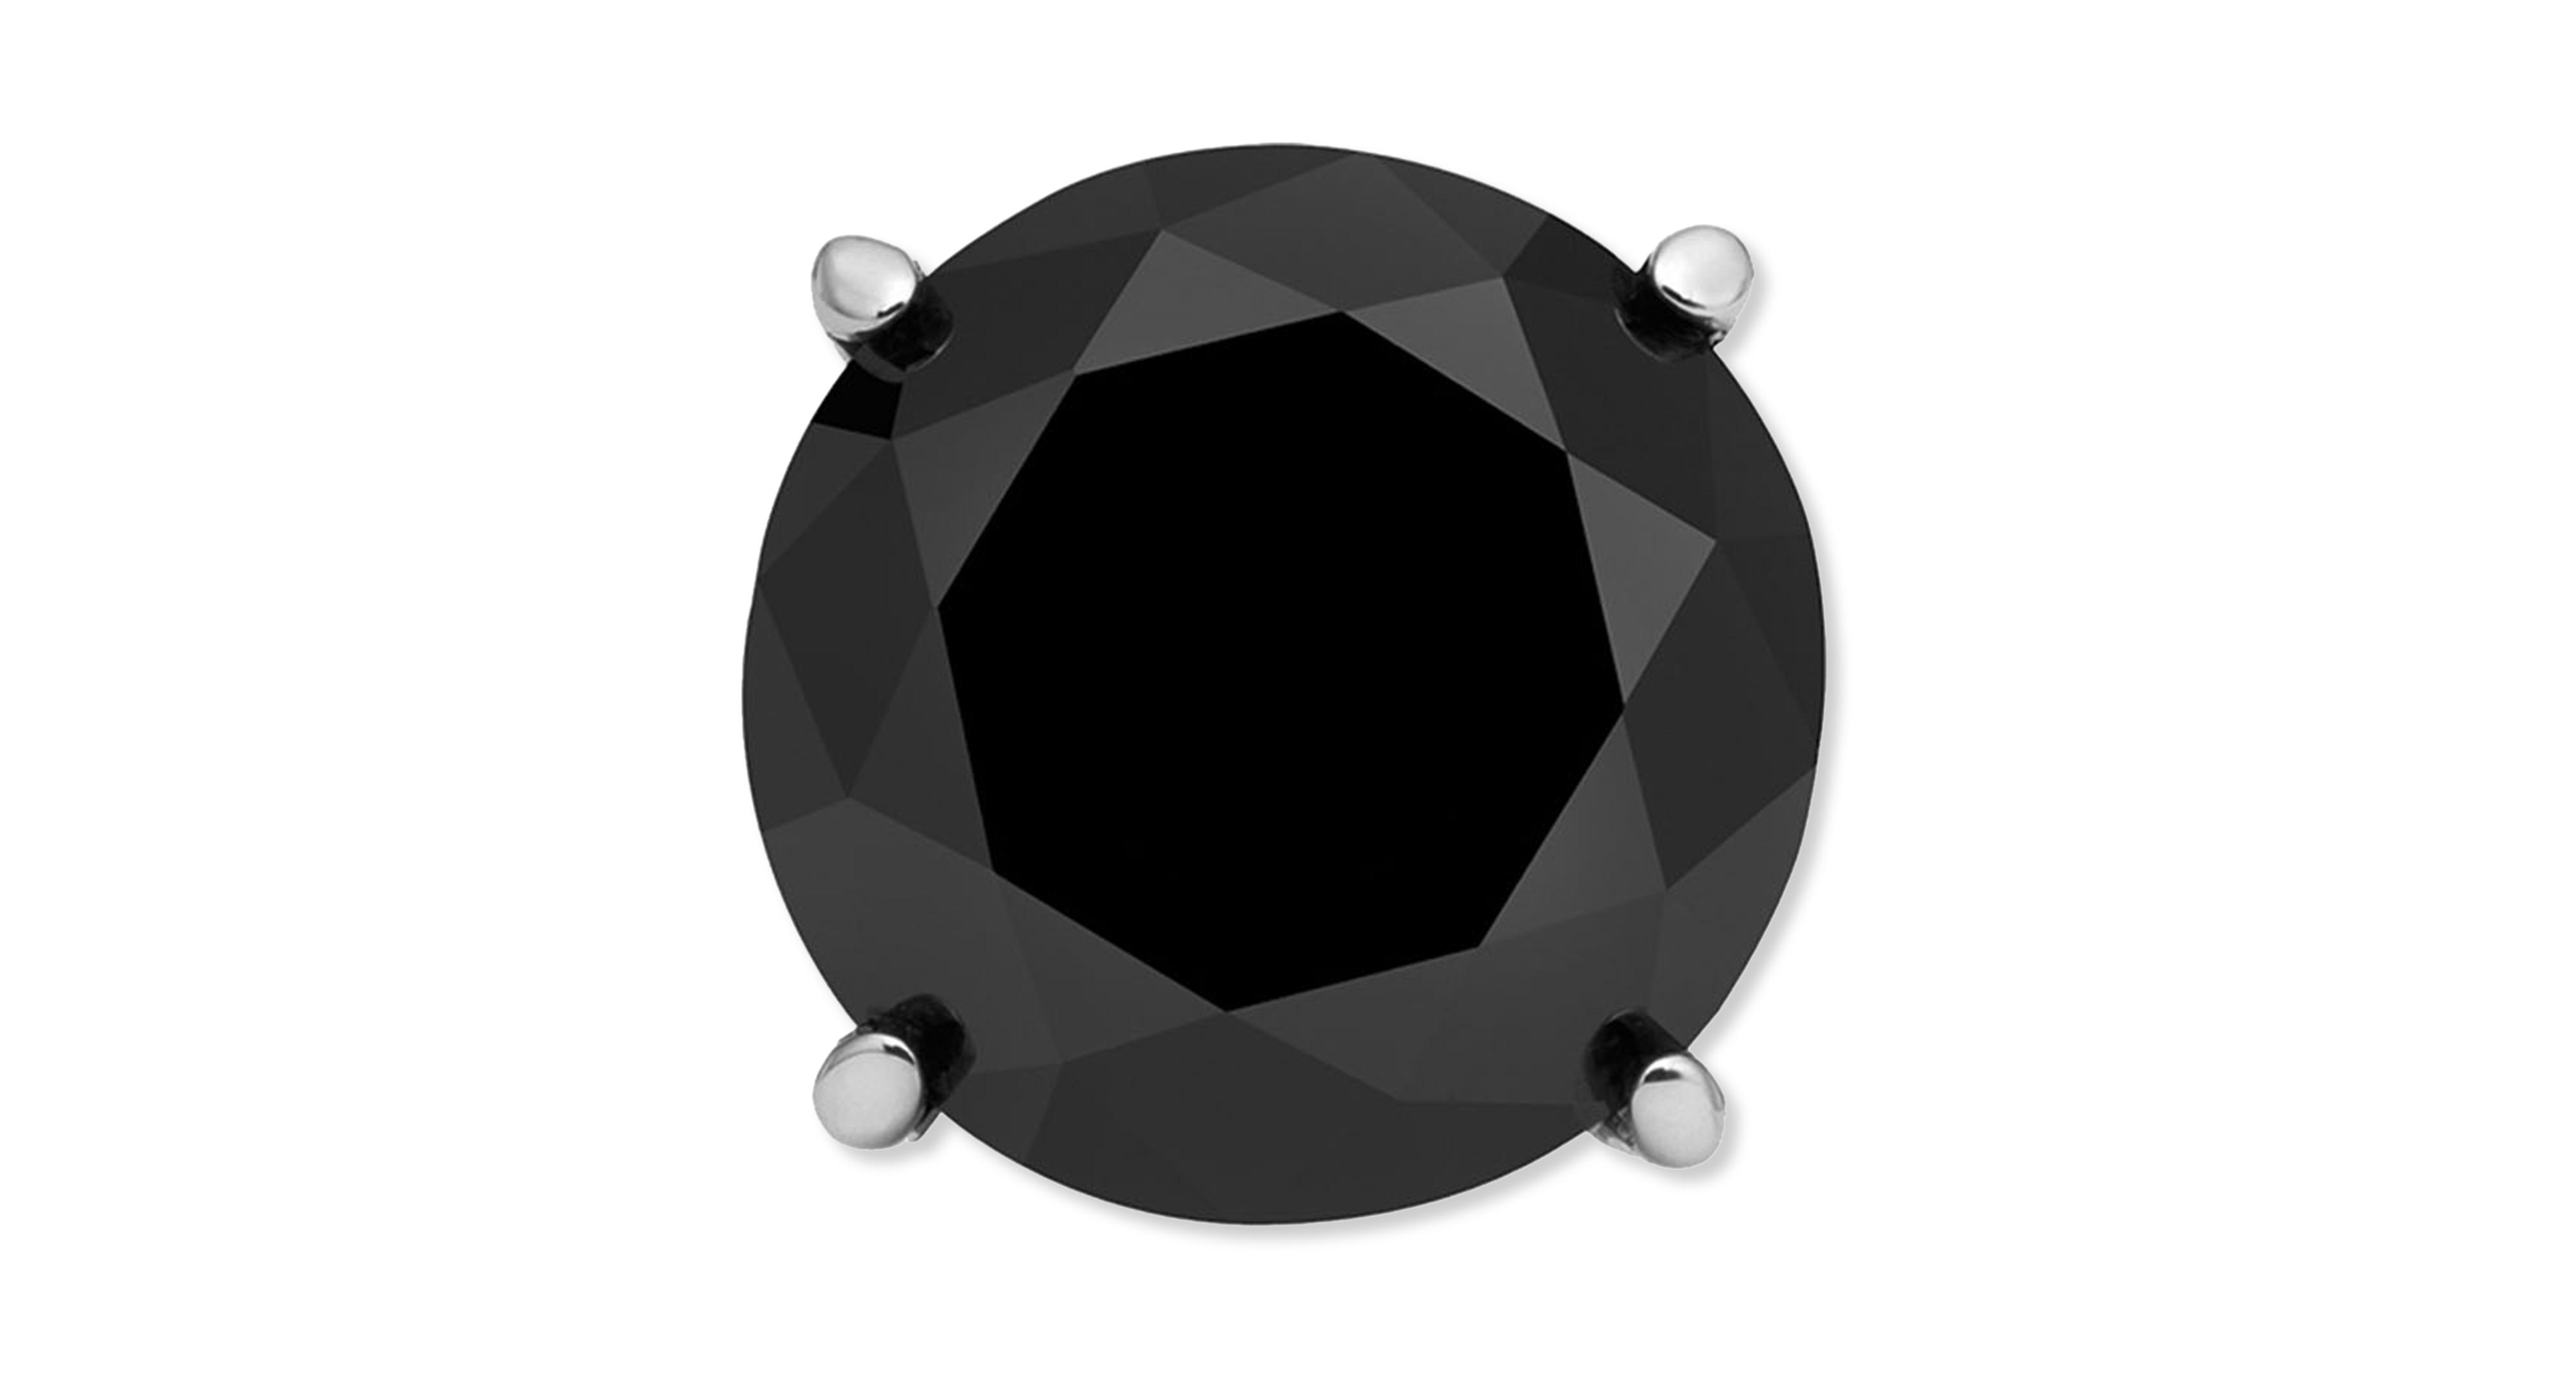 Men s Stainless Steel Earring Black Diamond Single Stud Earring